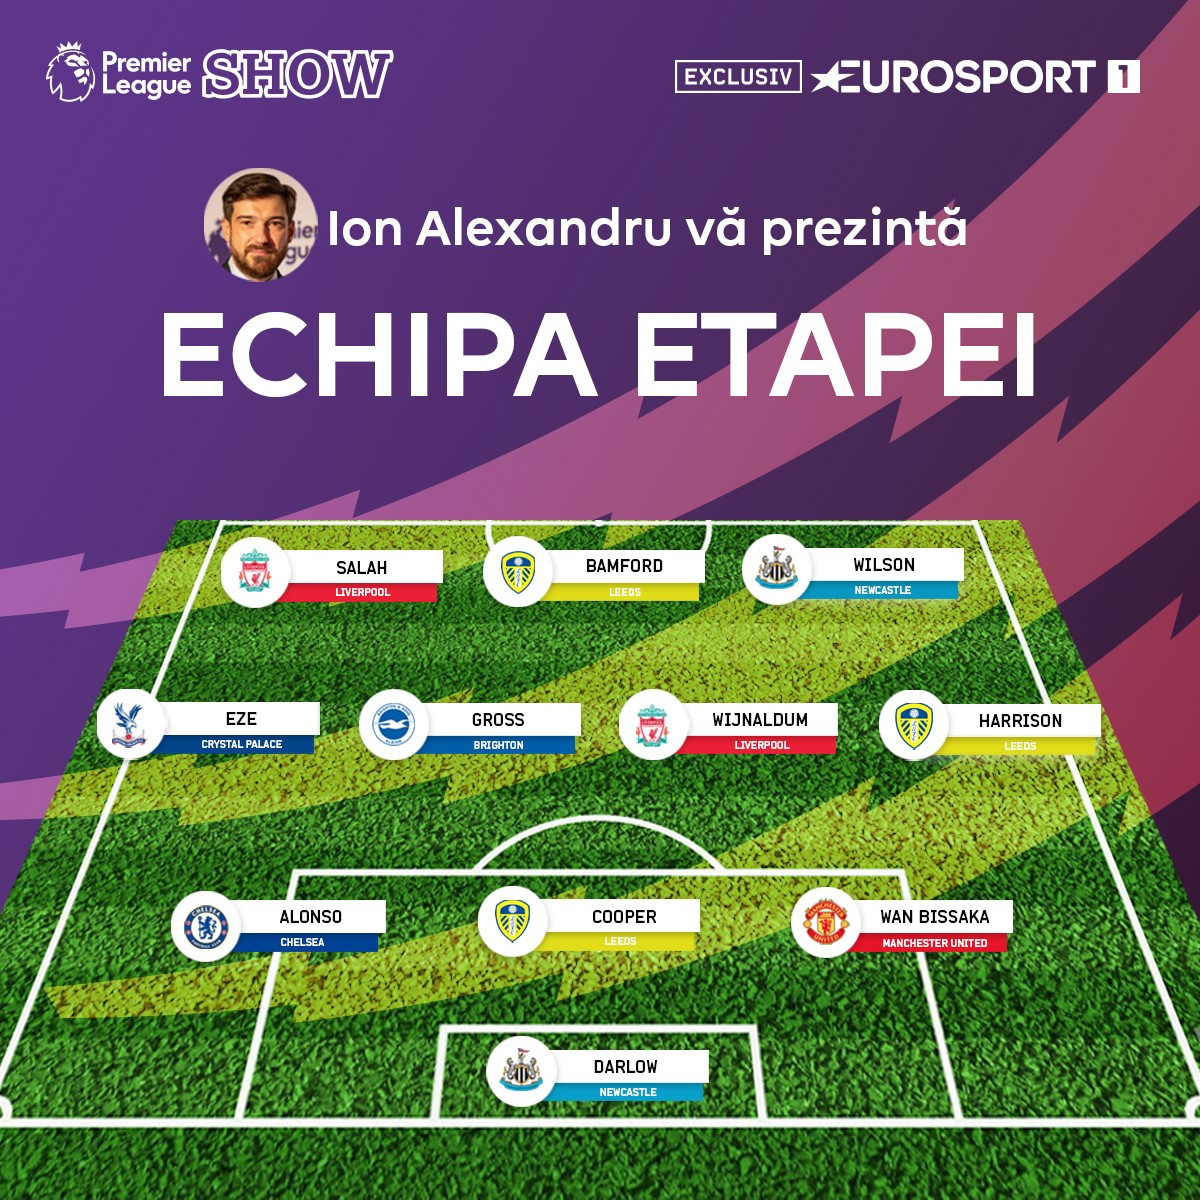 https://i.eurosport.com/2021/02/01/2982949.jpg